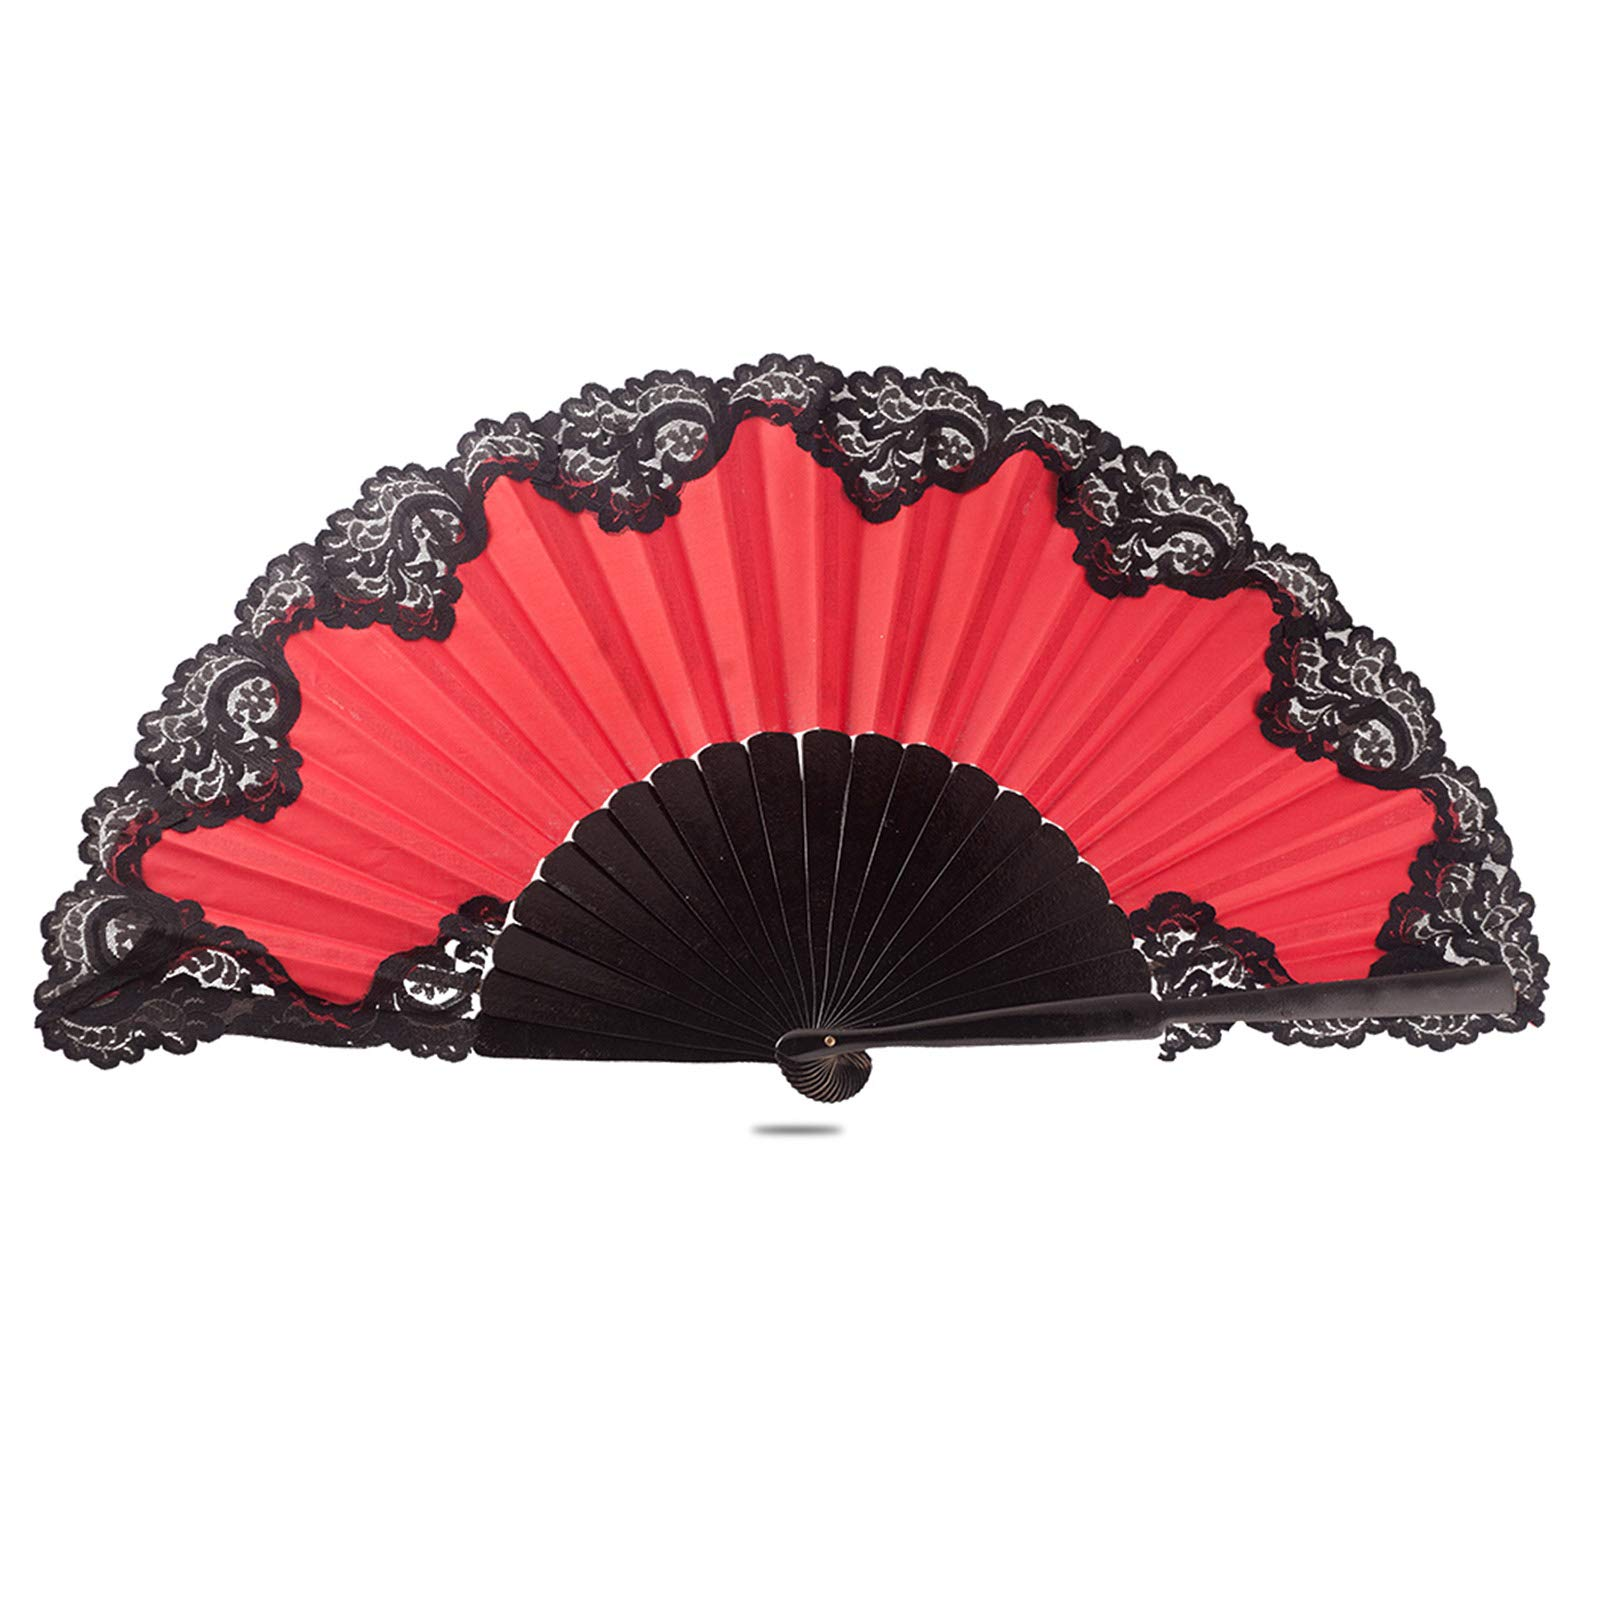 Ole Ole Flamenco Spanish Hand Fan Red Pericon with lace Black Large 13 inch 33 cm Handmade Made of Wood and Fabric Abanicos Españoles Rojo Blonda Negra by Ole Ole Flamenco